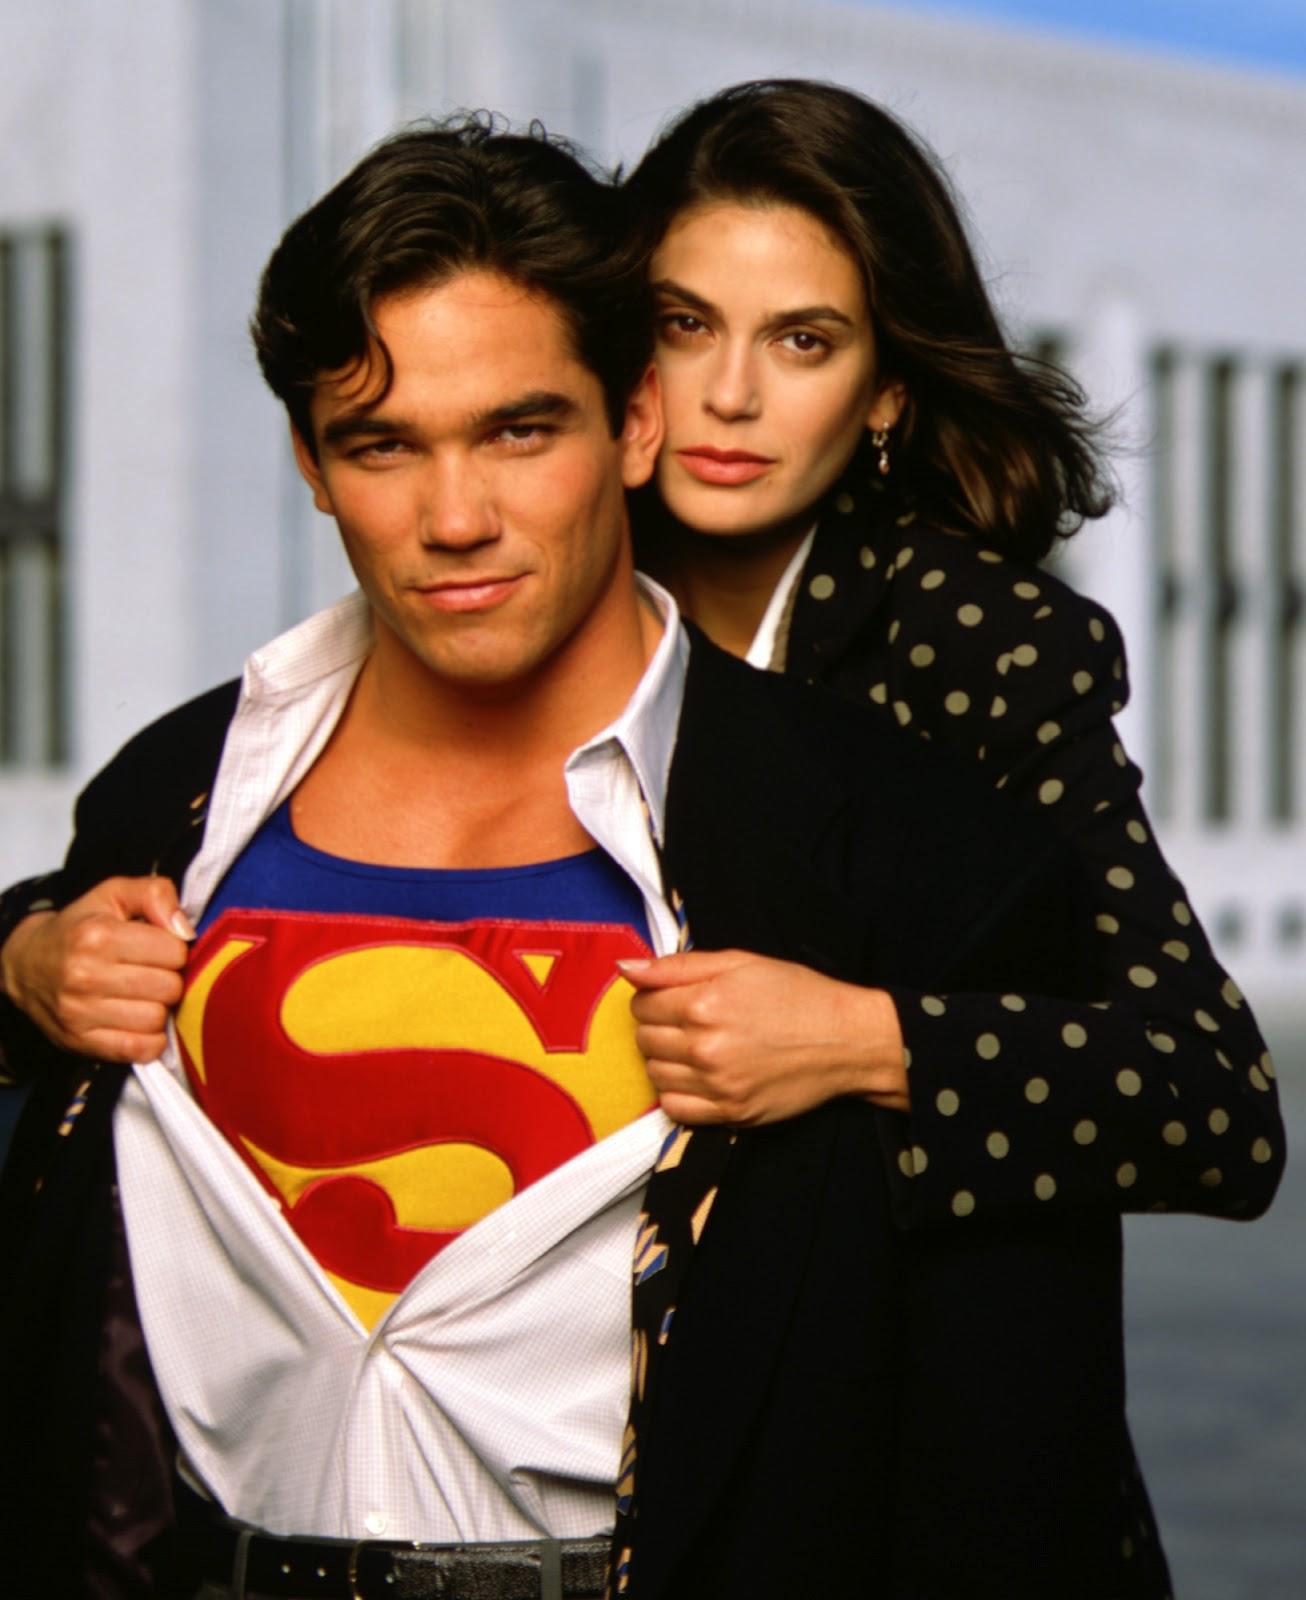 When Do Clark And Lois Start Hookup